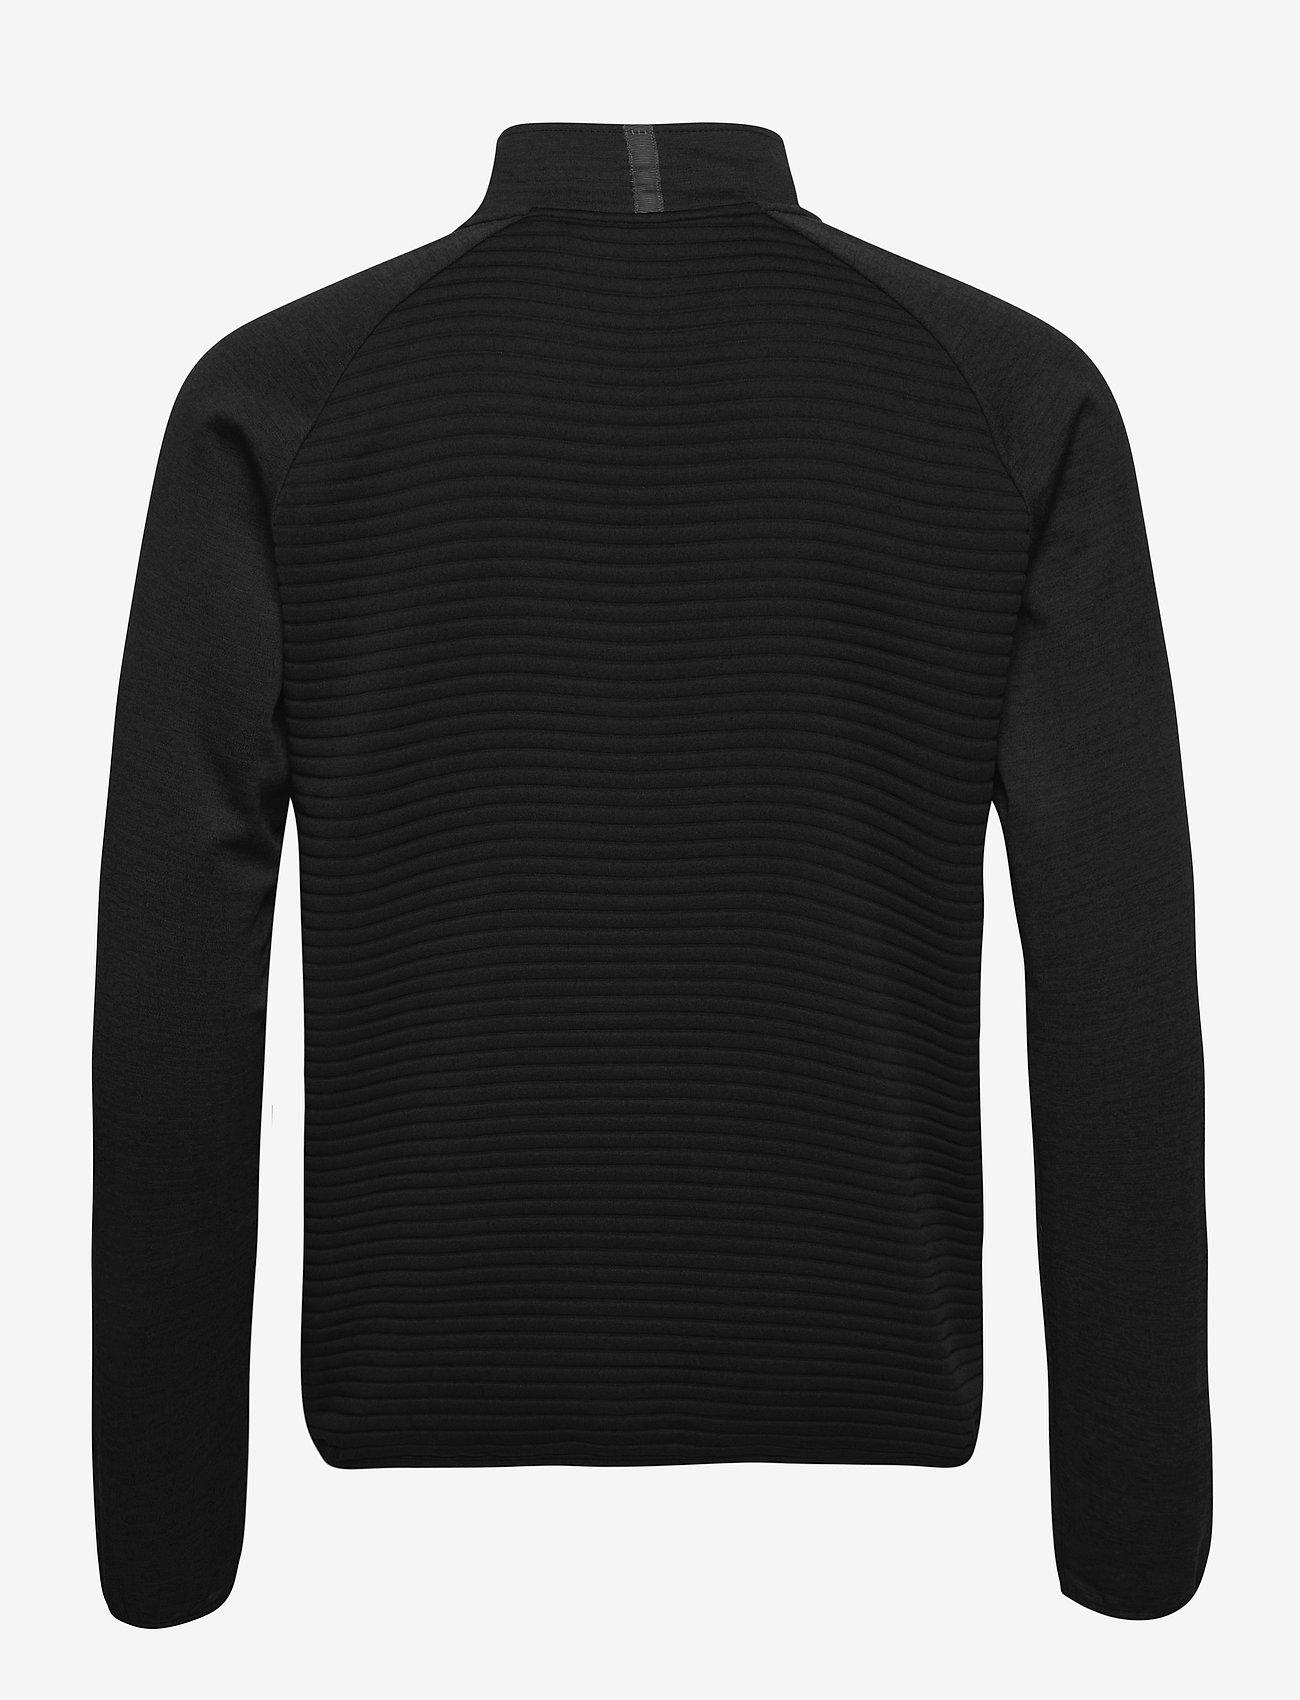 Abacus - Mens Turnberry 3D stripe fleece fullzip - golf jackets - black - 1